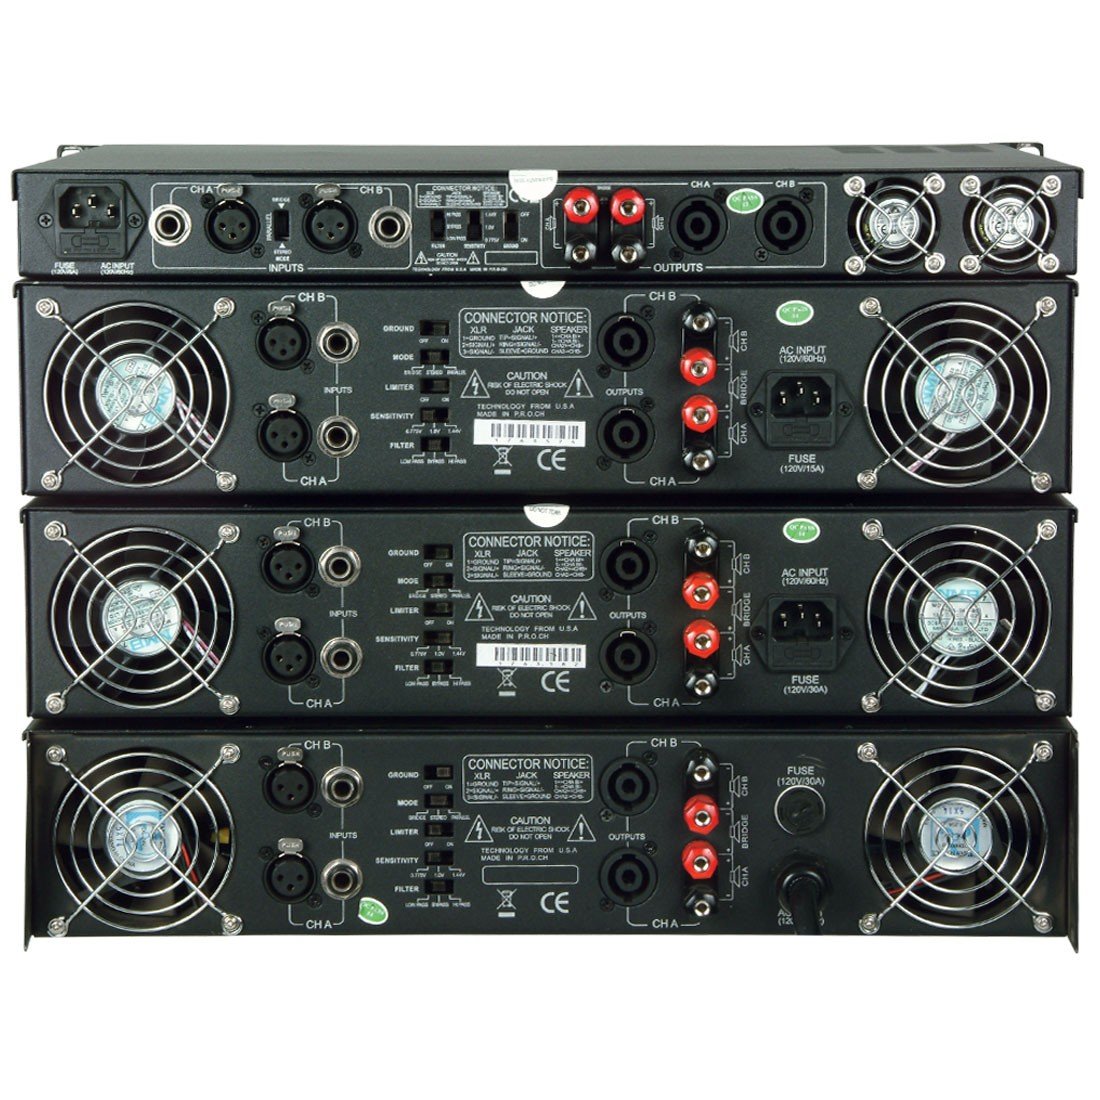 vlp1500 power amplifier amplifier audio products adj group rh americandj eu american audio vlp300 power amplifier manual American Audio Speakers